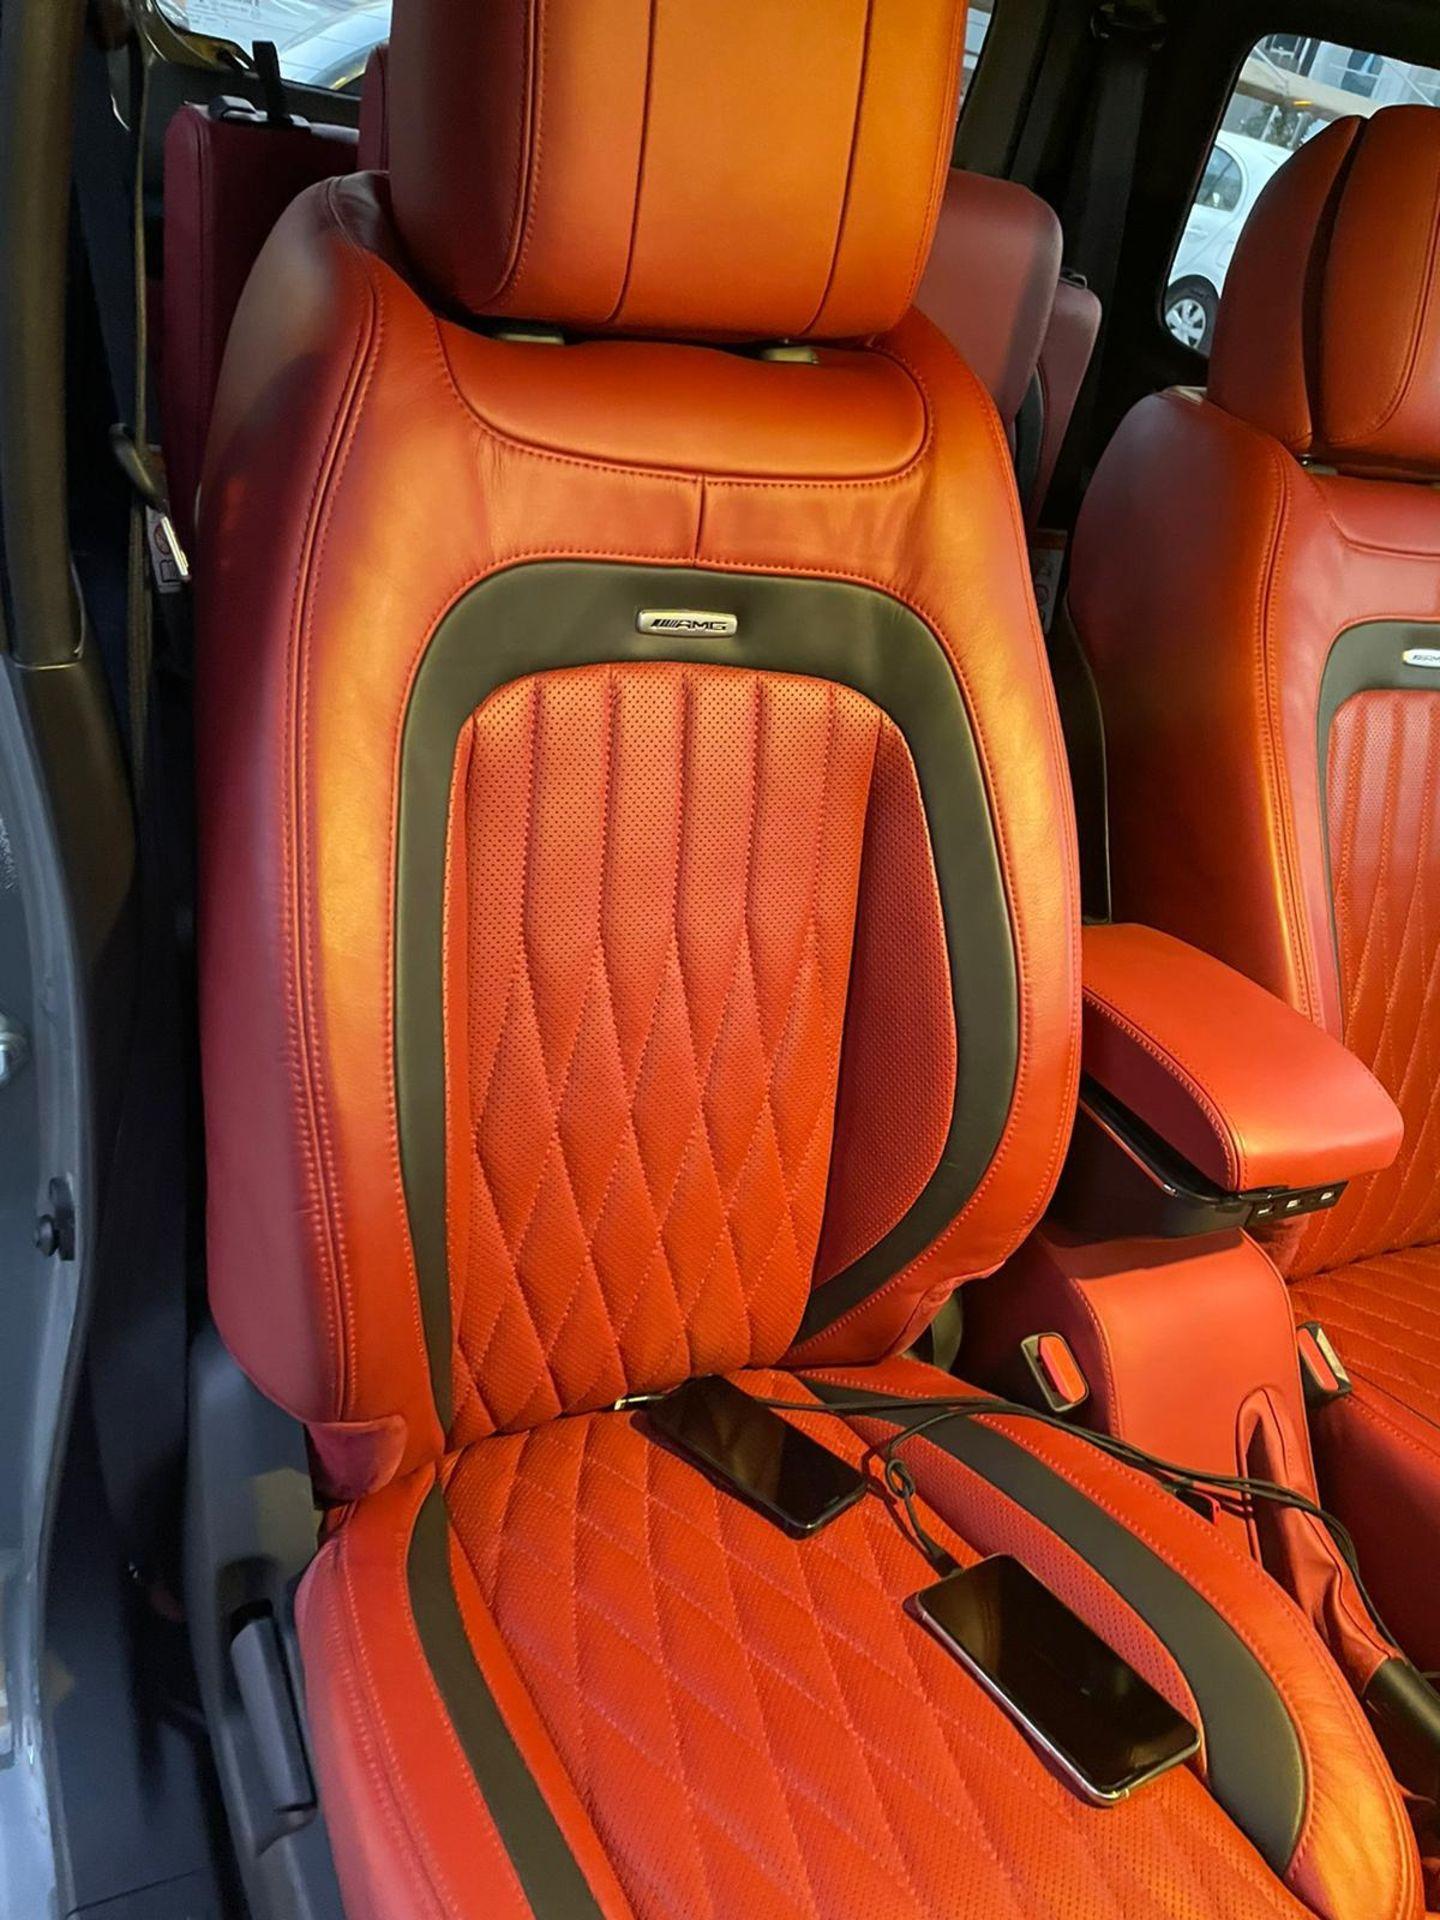 *RESERVE MET* - 2019 Suzuki Jimny Converted to Mini G - Mini Mercedes G Wagon G63 Brabus. - Image 5 of 6